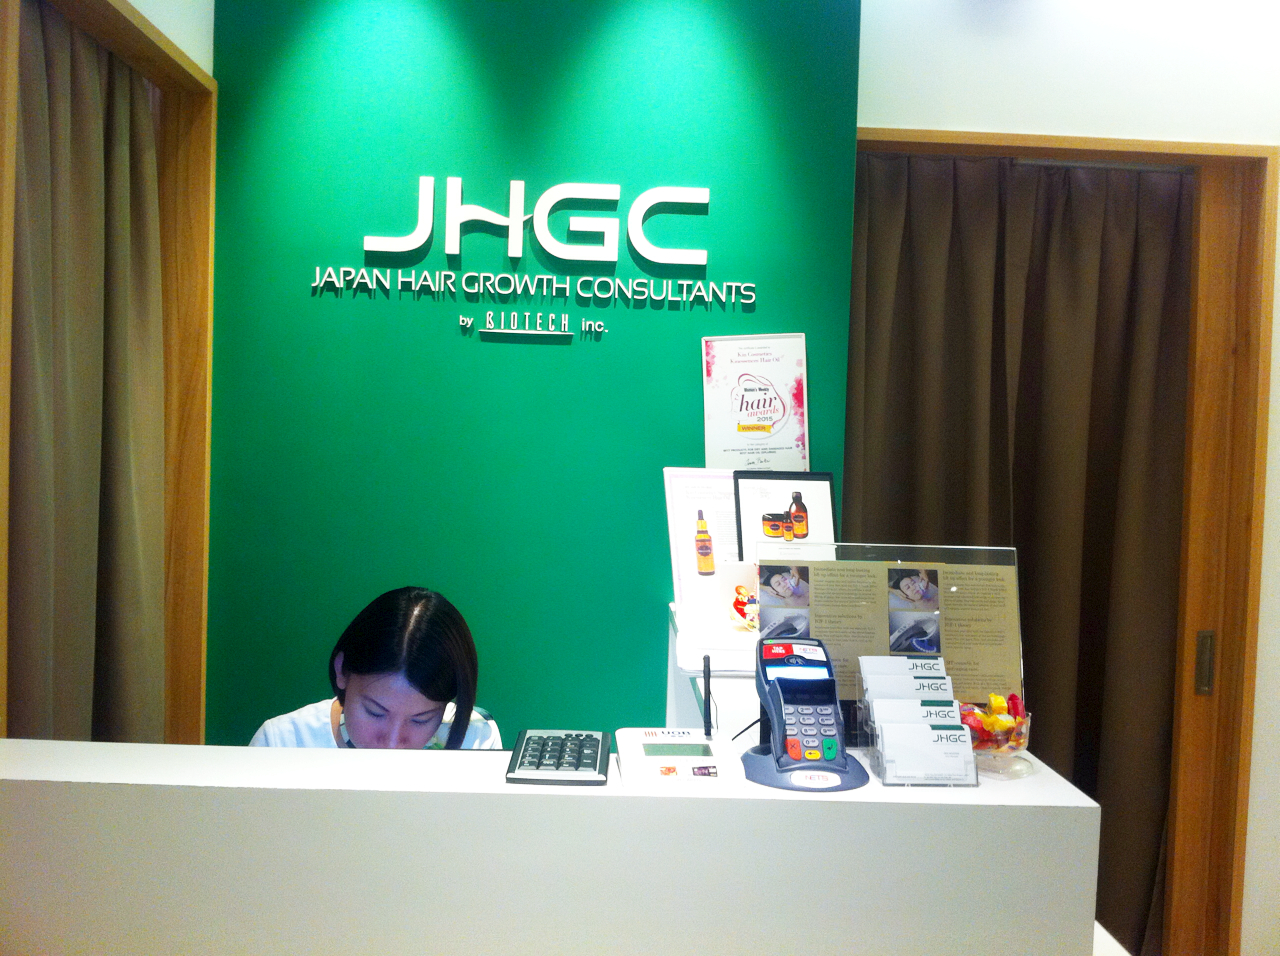 Sakura Lisha My First Experience At Japan Hair Growth Consultants